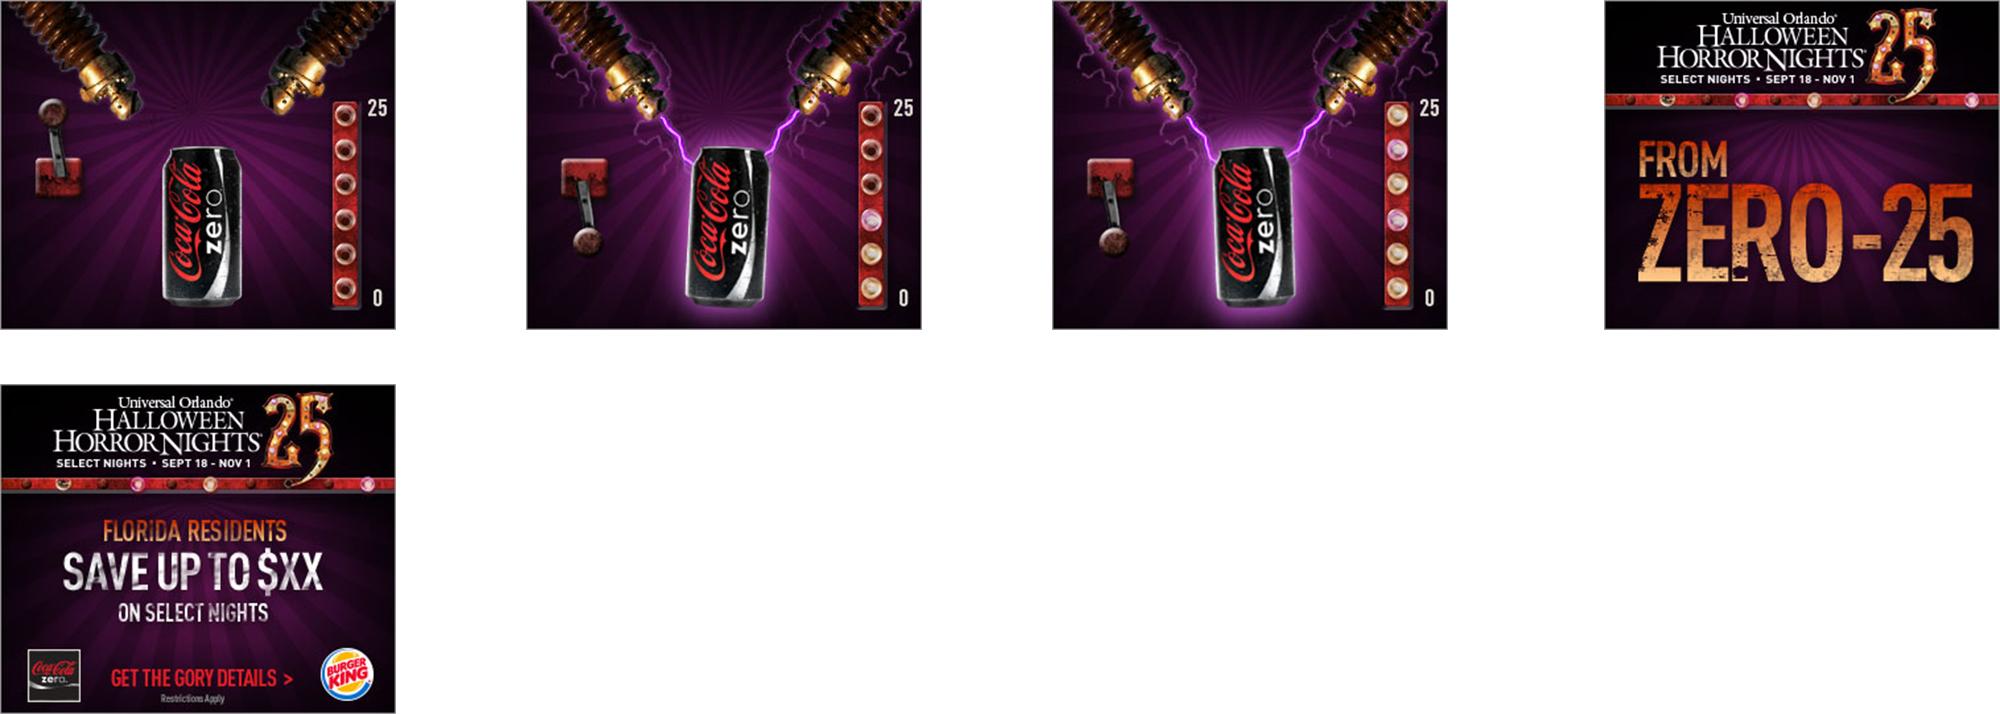 Coke Offer Display Media